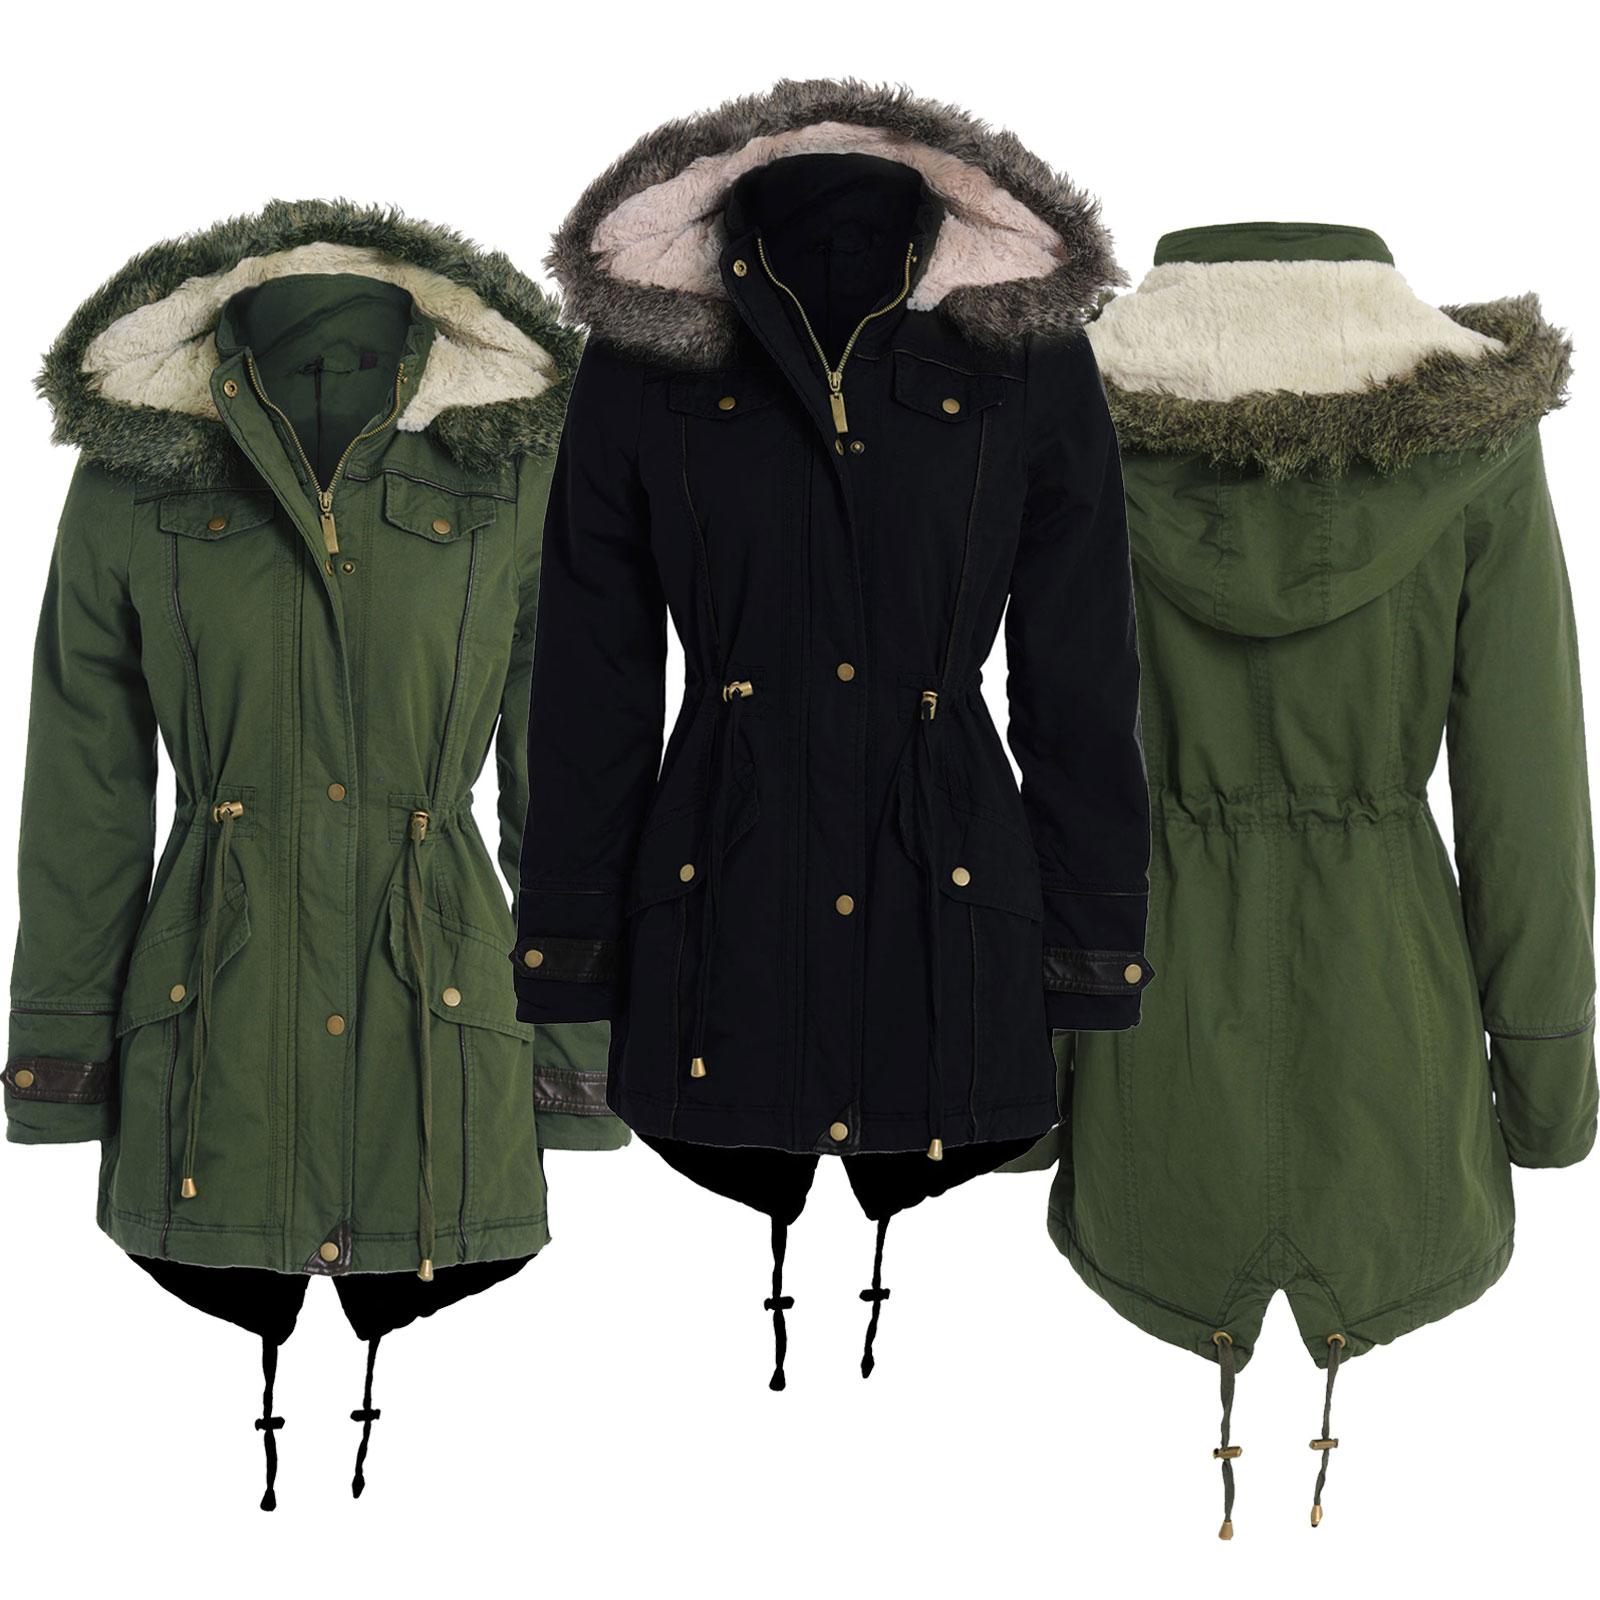 Plus size womens winter coats on sale